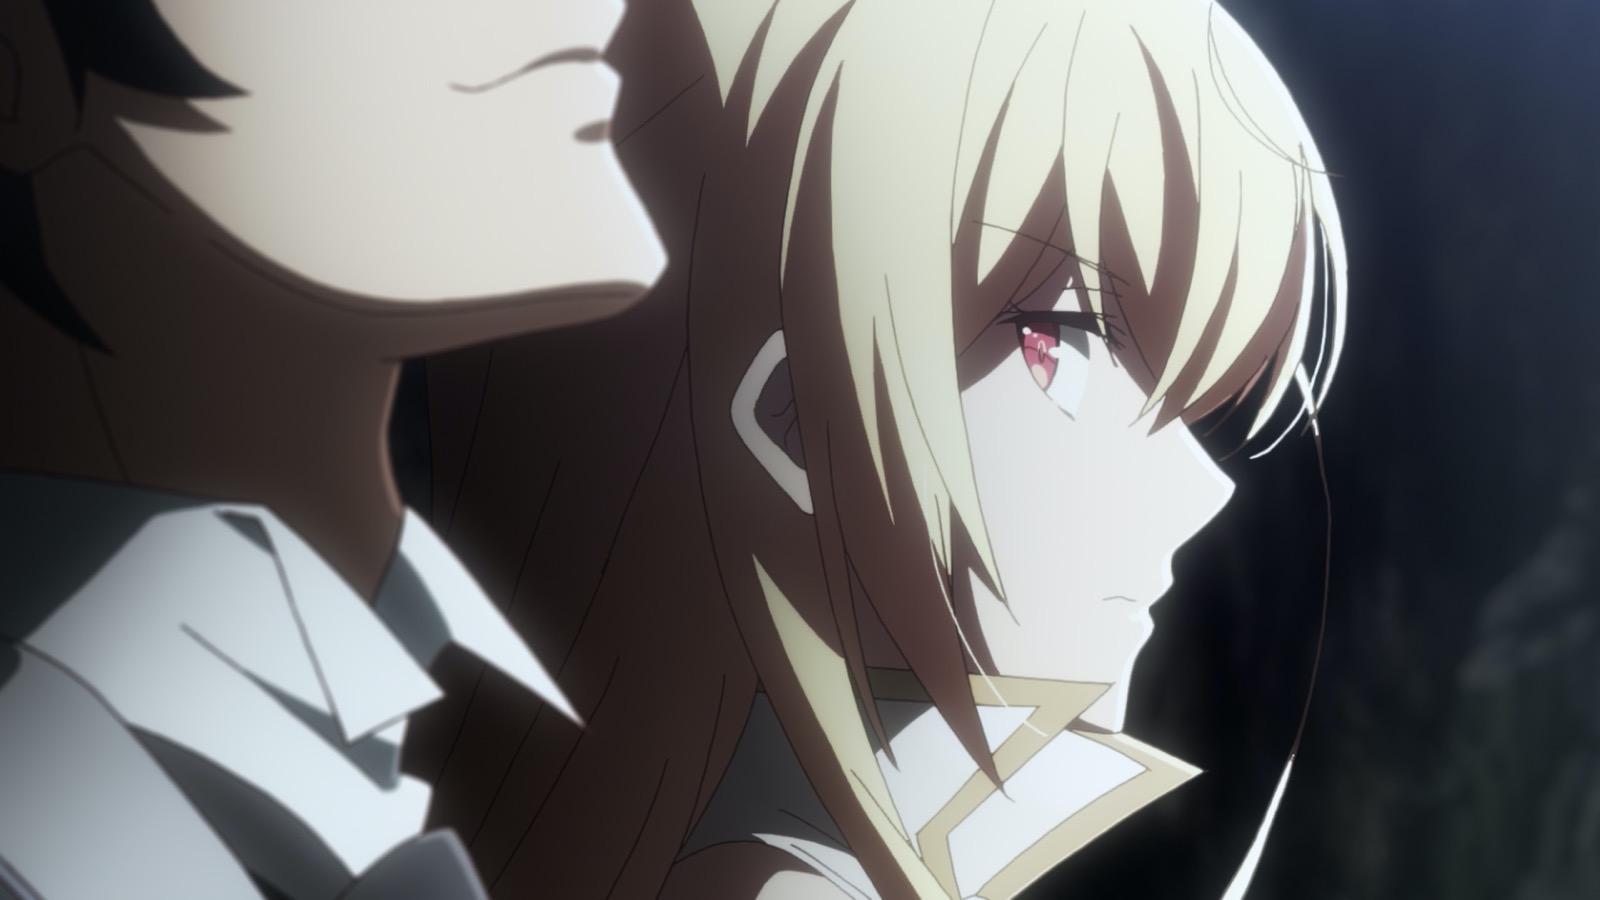 Kimi to Boku no Saigo no Senjou - Capítulo 5